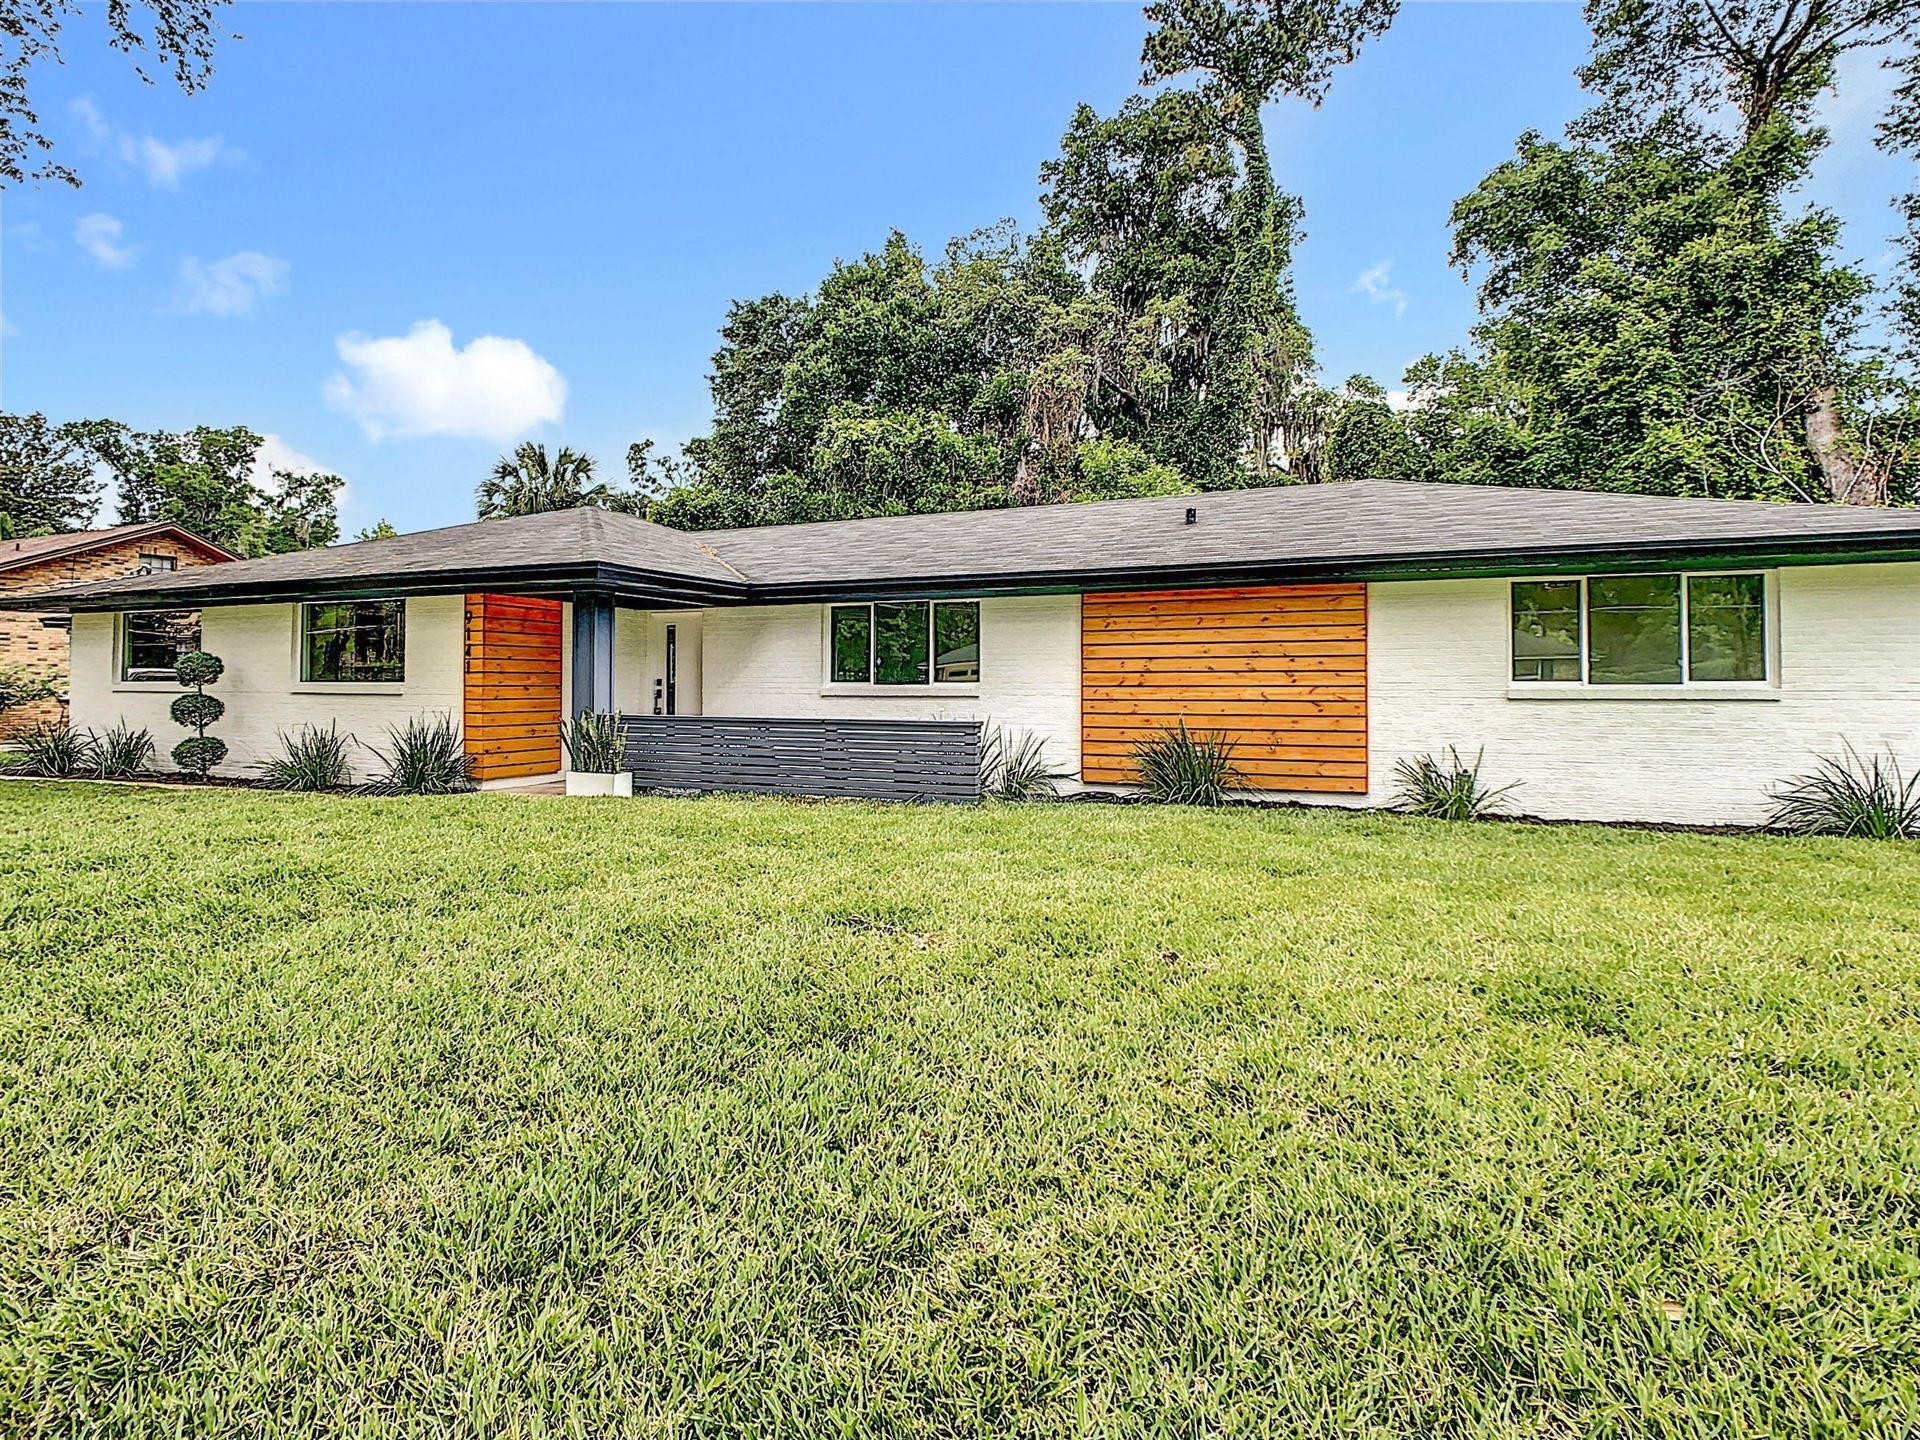 9141 KINGS COLONY RD, Jacksonville, FL 32257 - MLS#: 1108356